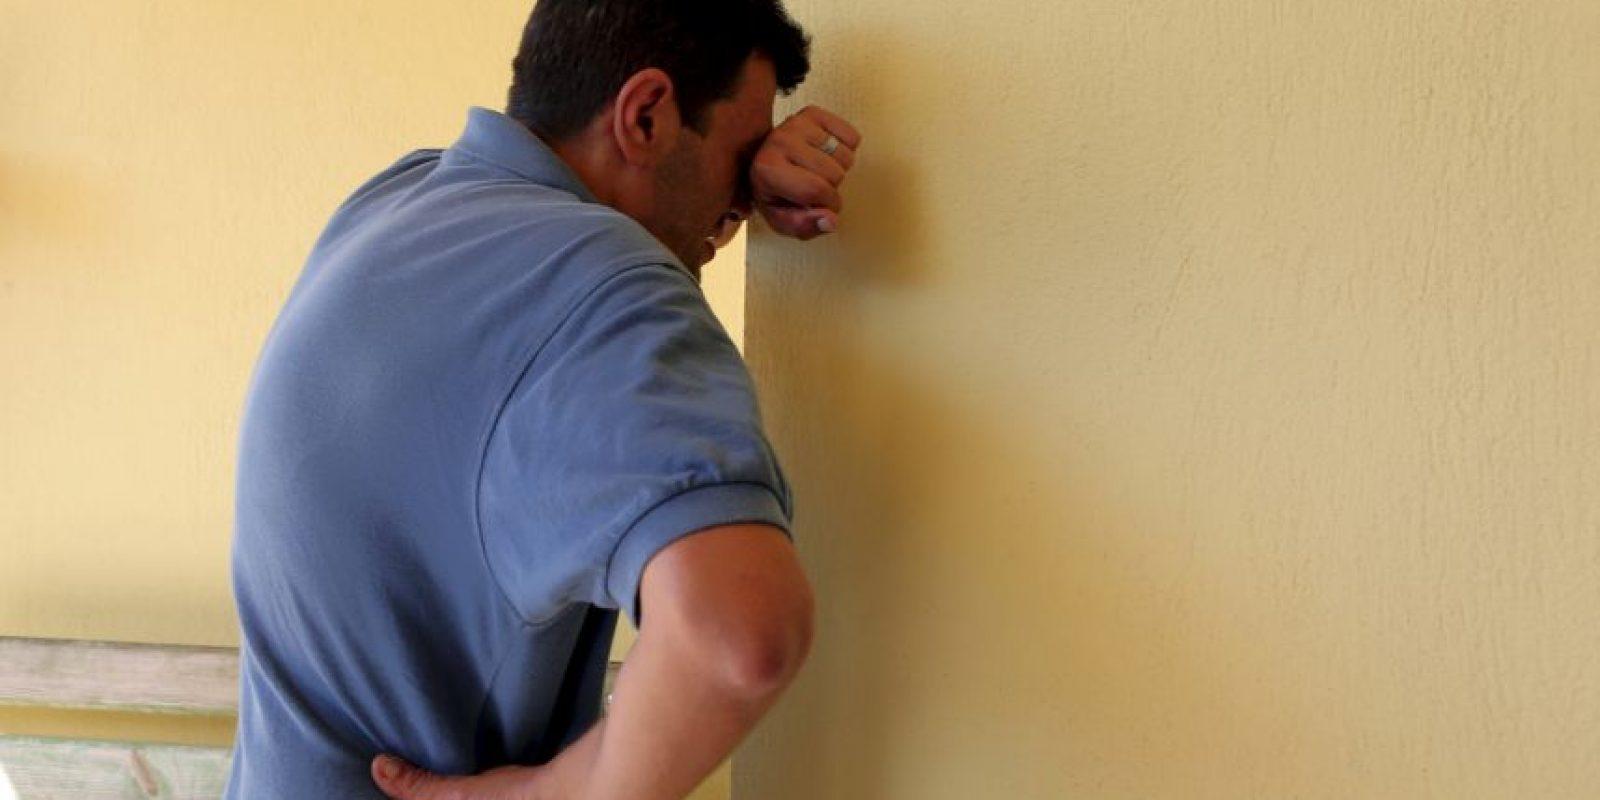 El único que sobrevivió fue su padre Abdullah Kurdi. Foto:AP